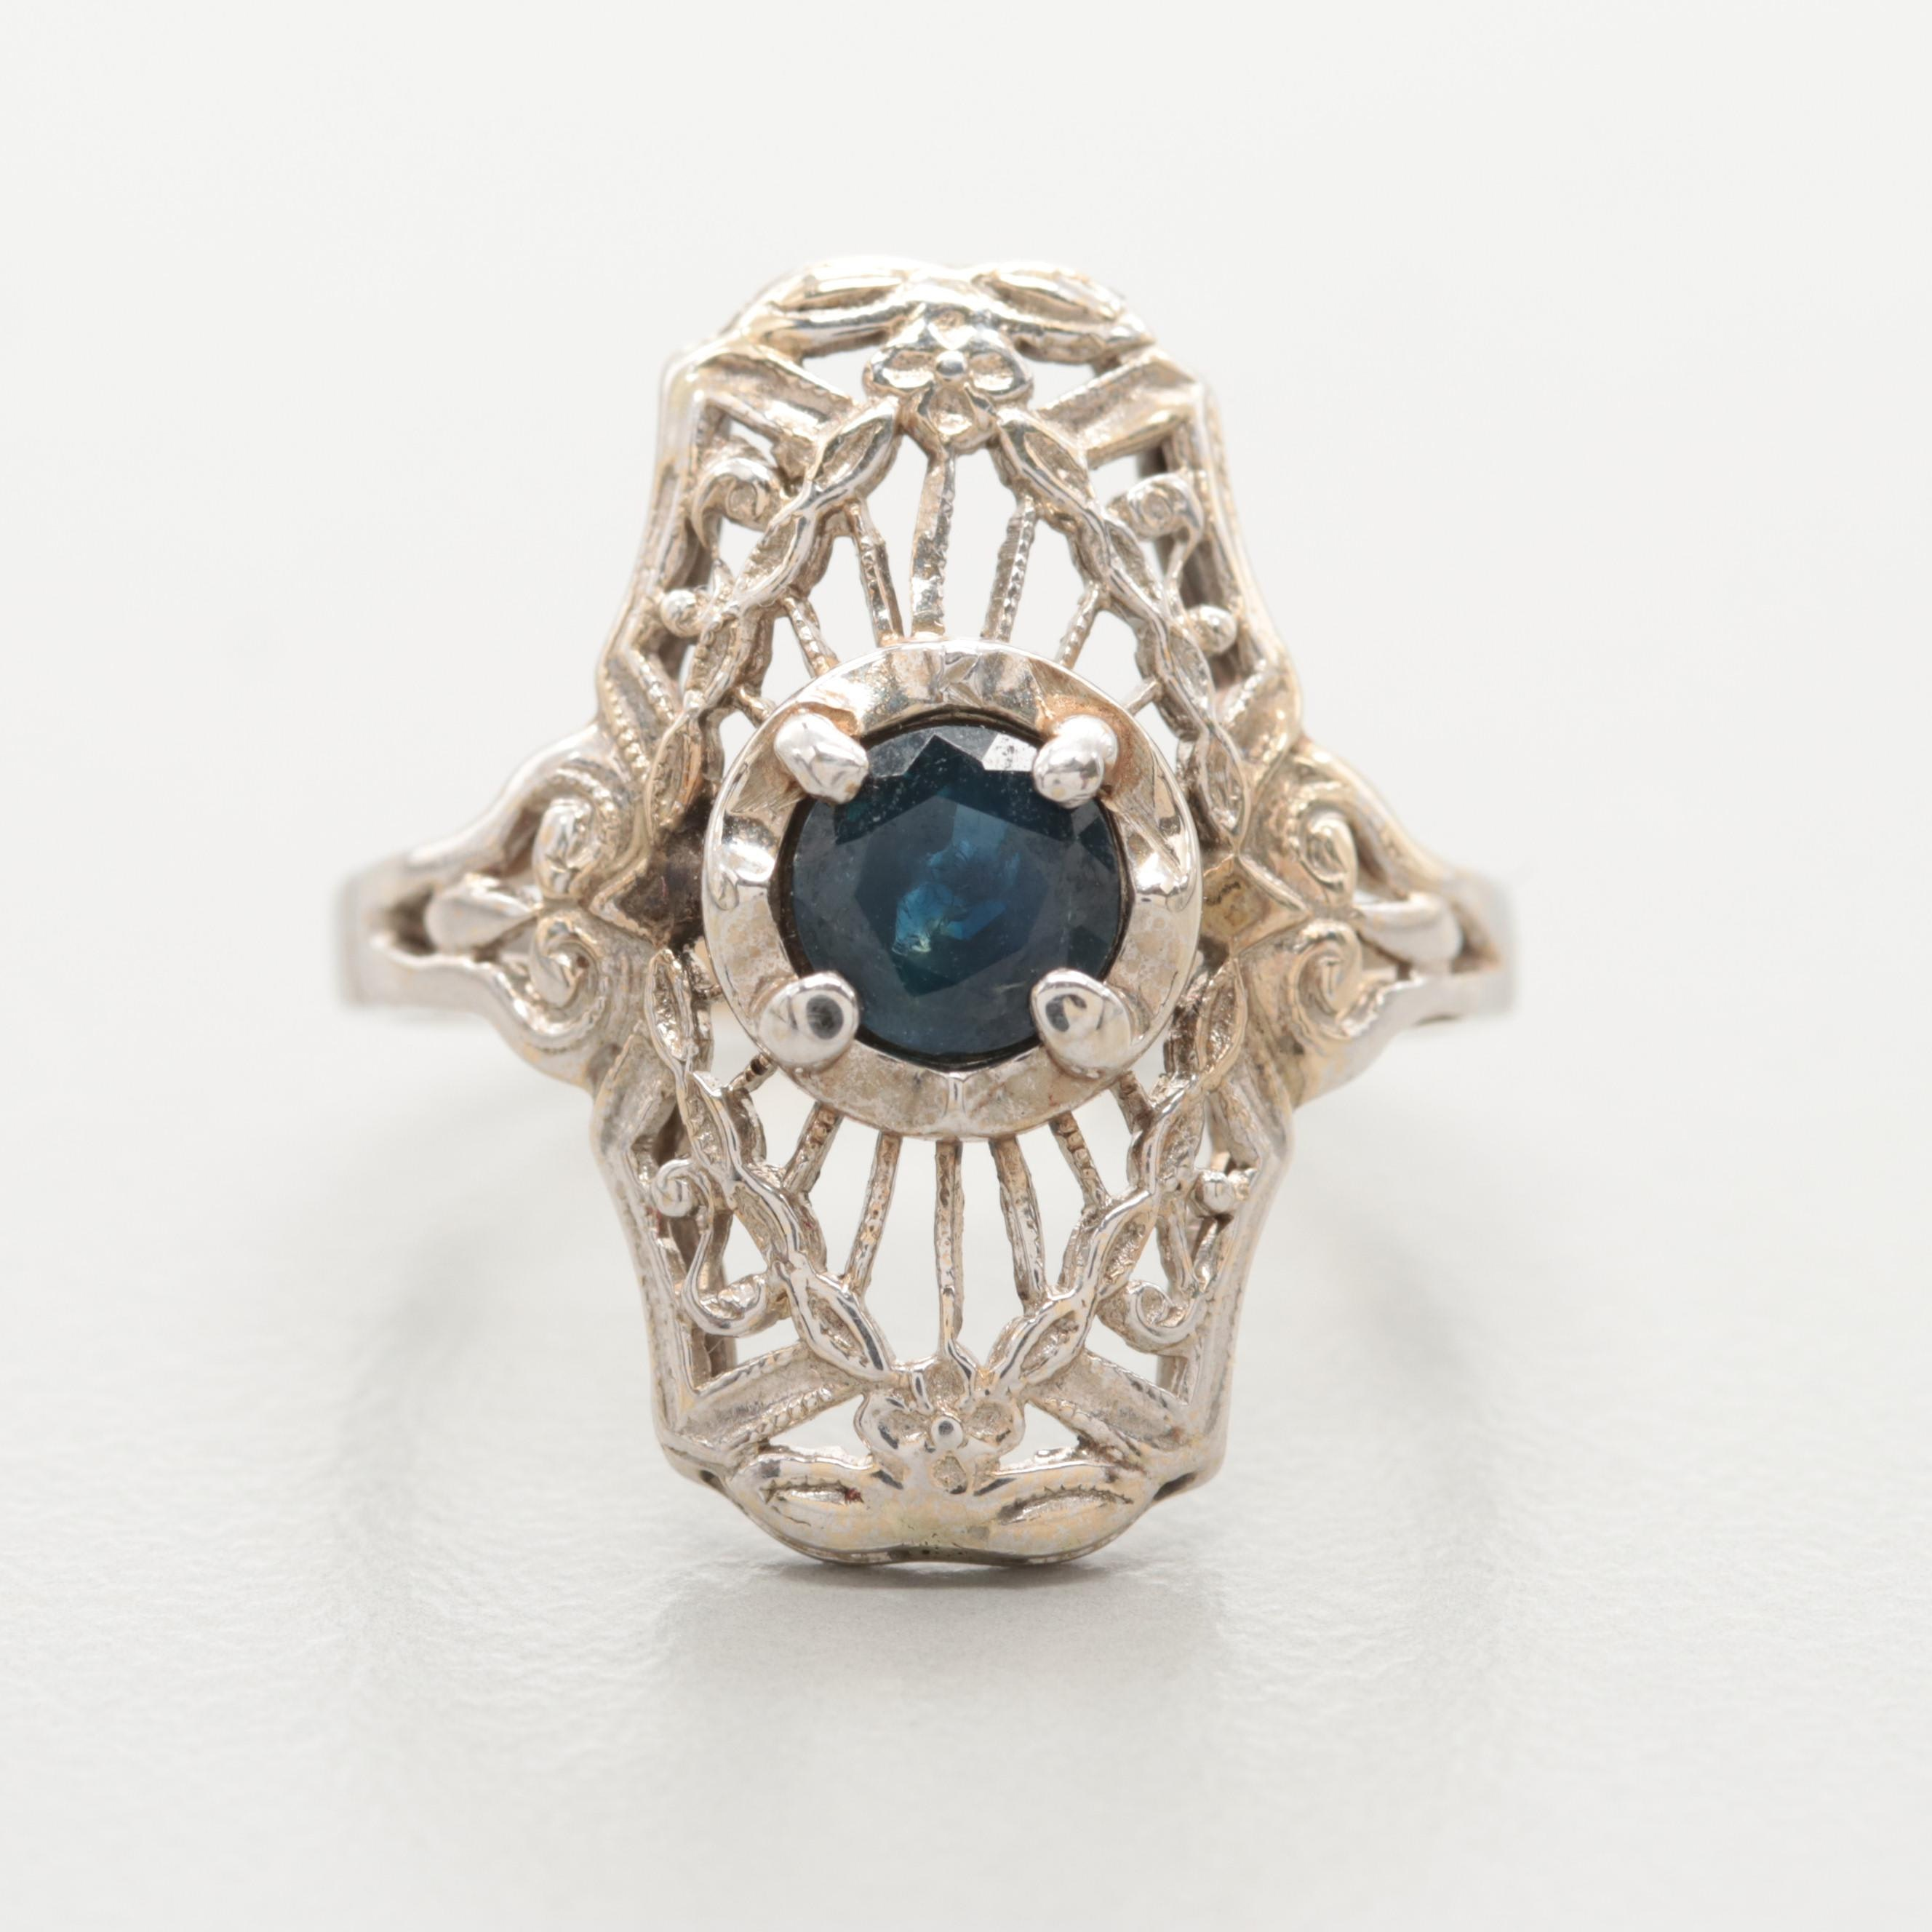 Edwardian 14K White Gold Blue Sapphire Ring